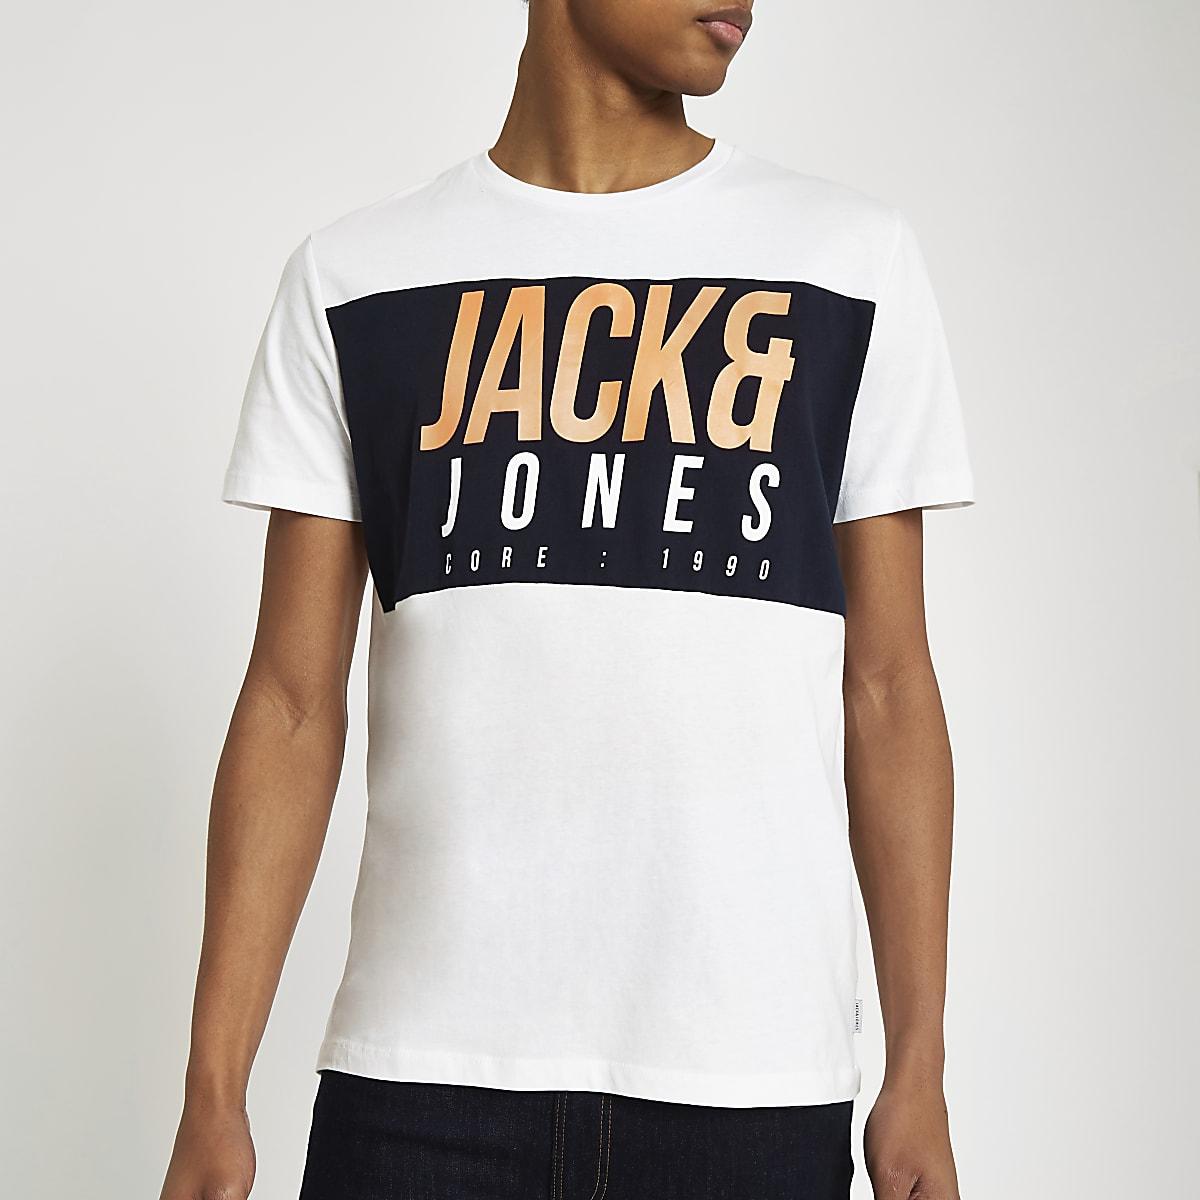 Jack & Jones Jonas white logo print T-shirt